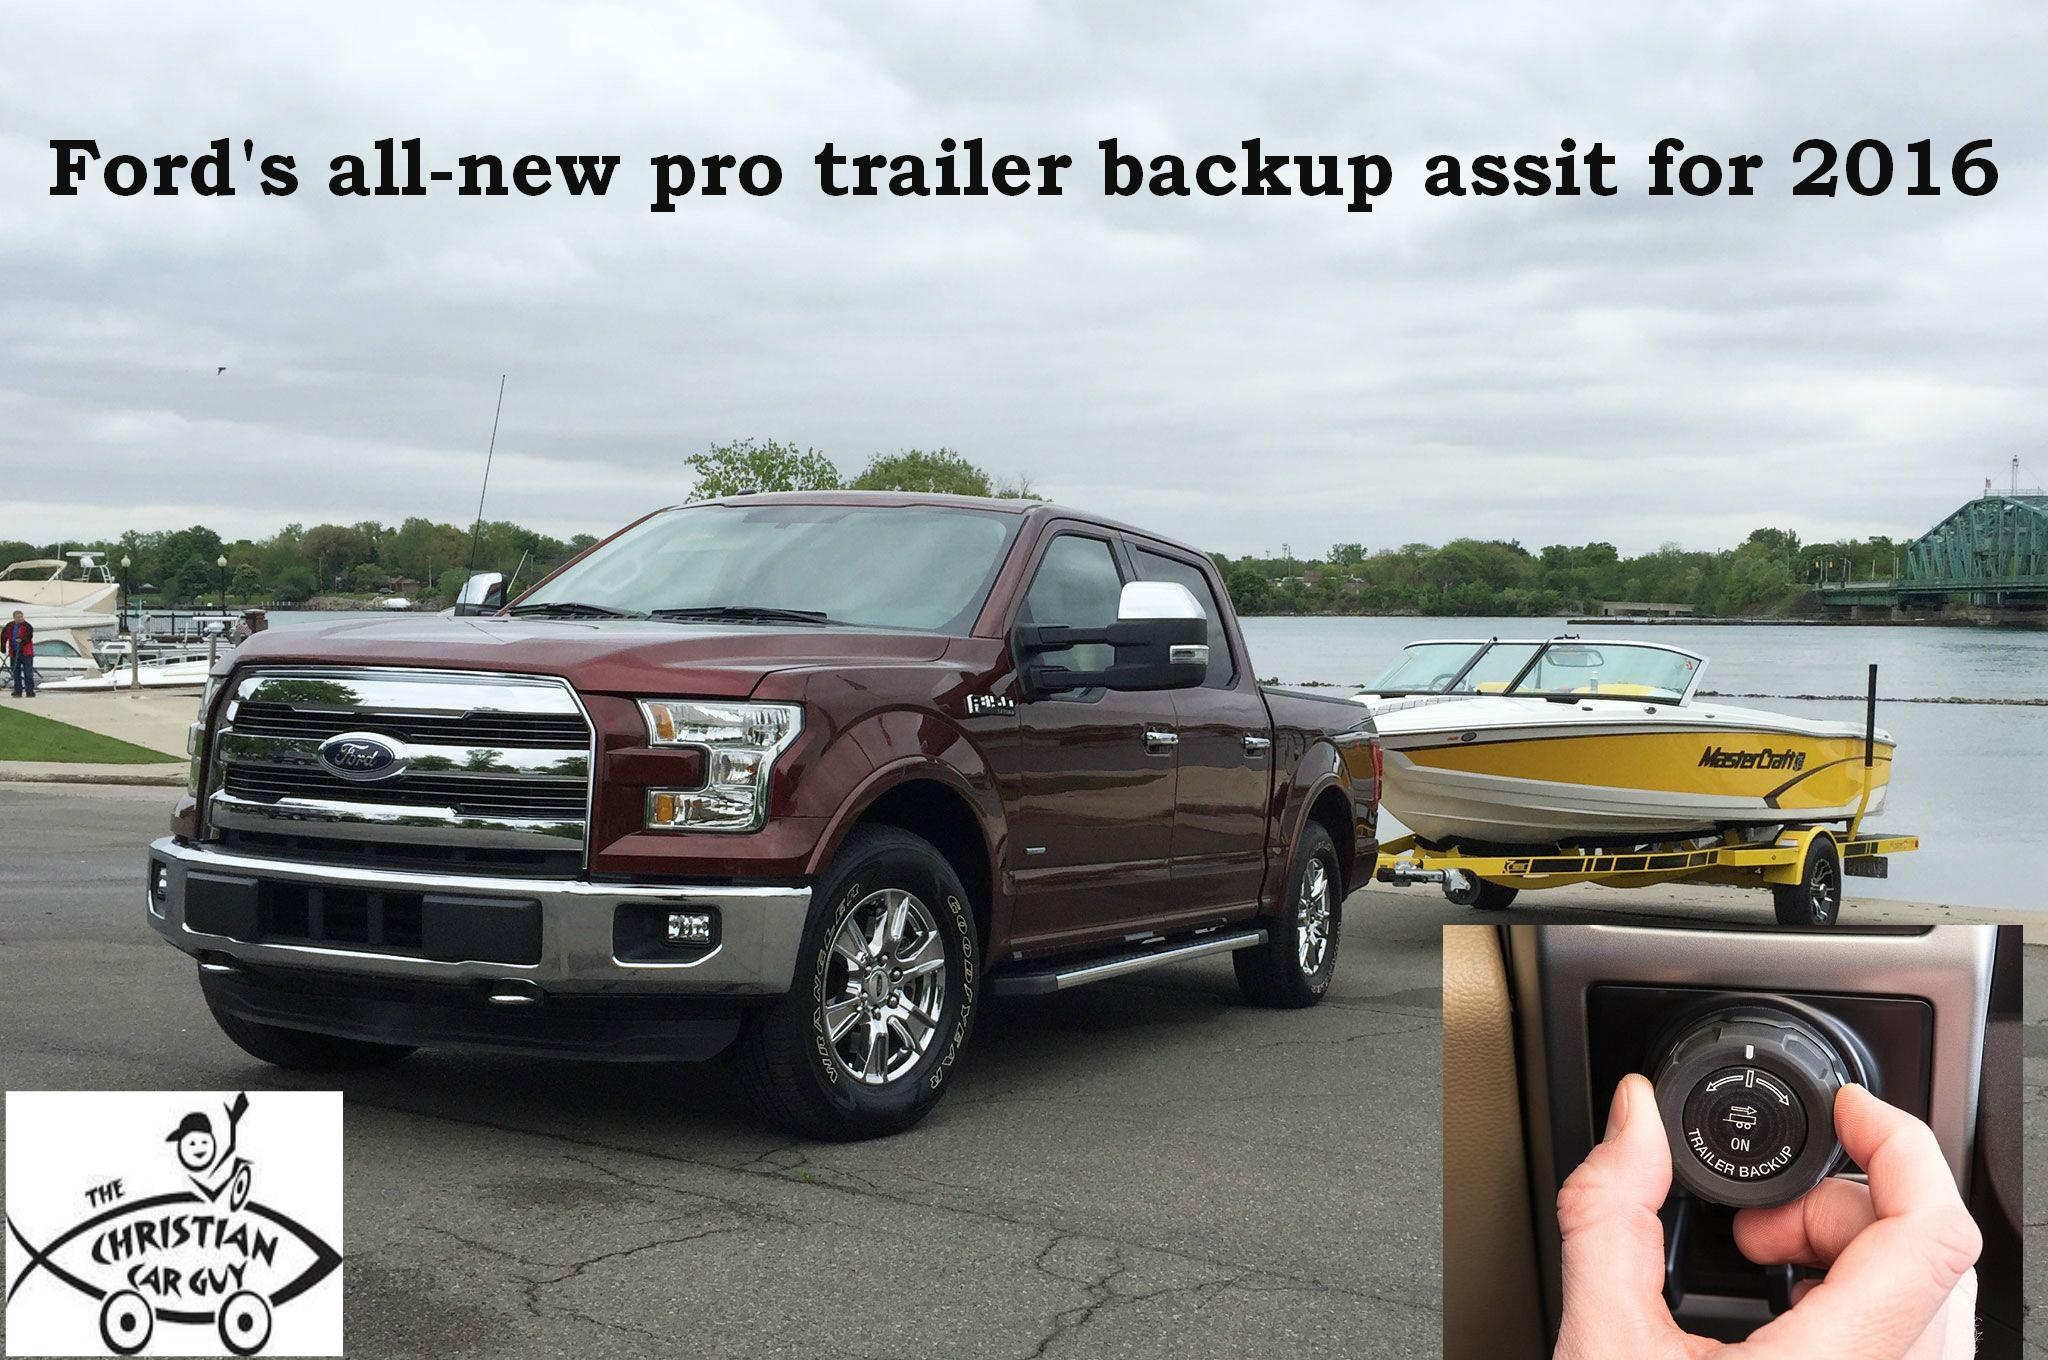 2016-ford-f150-pro-trailer-backup-assist-lead